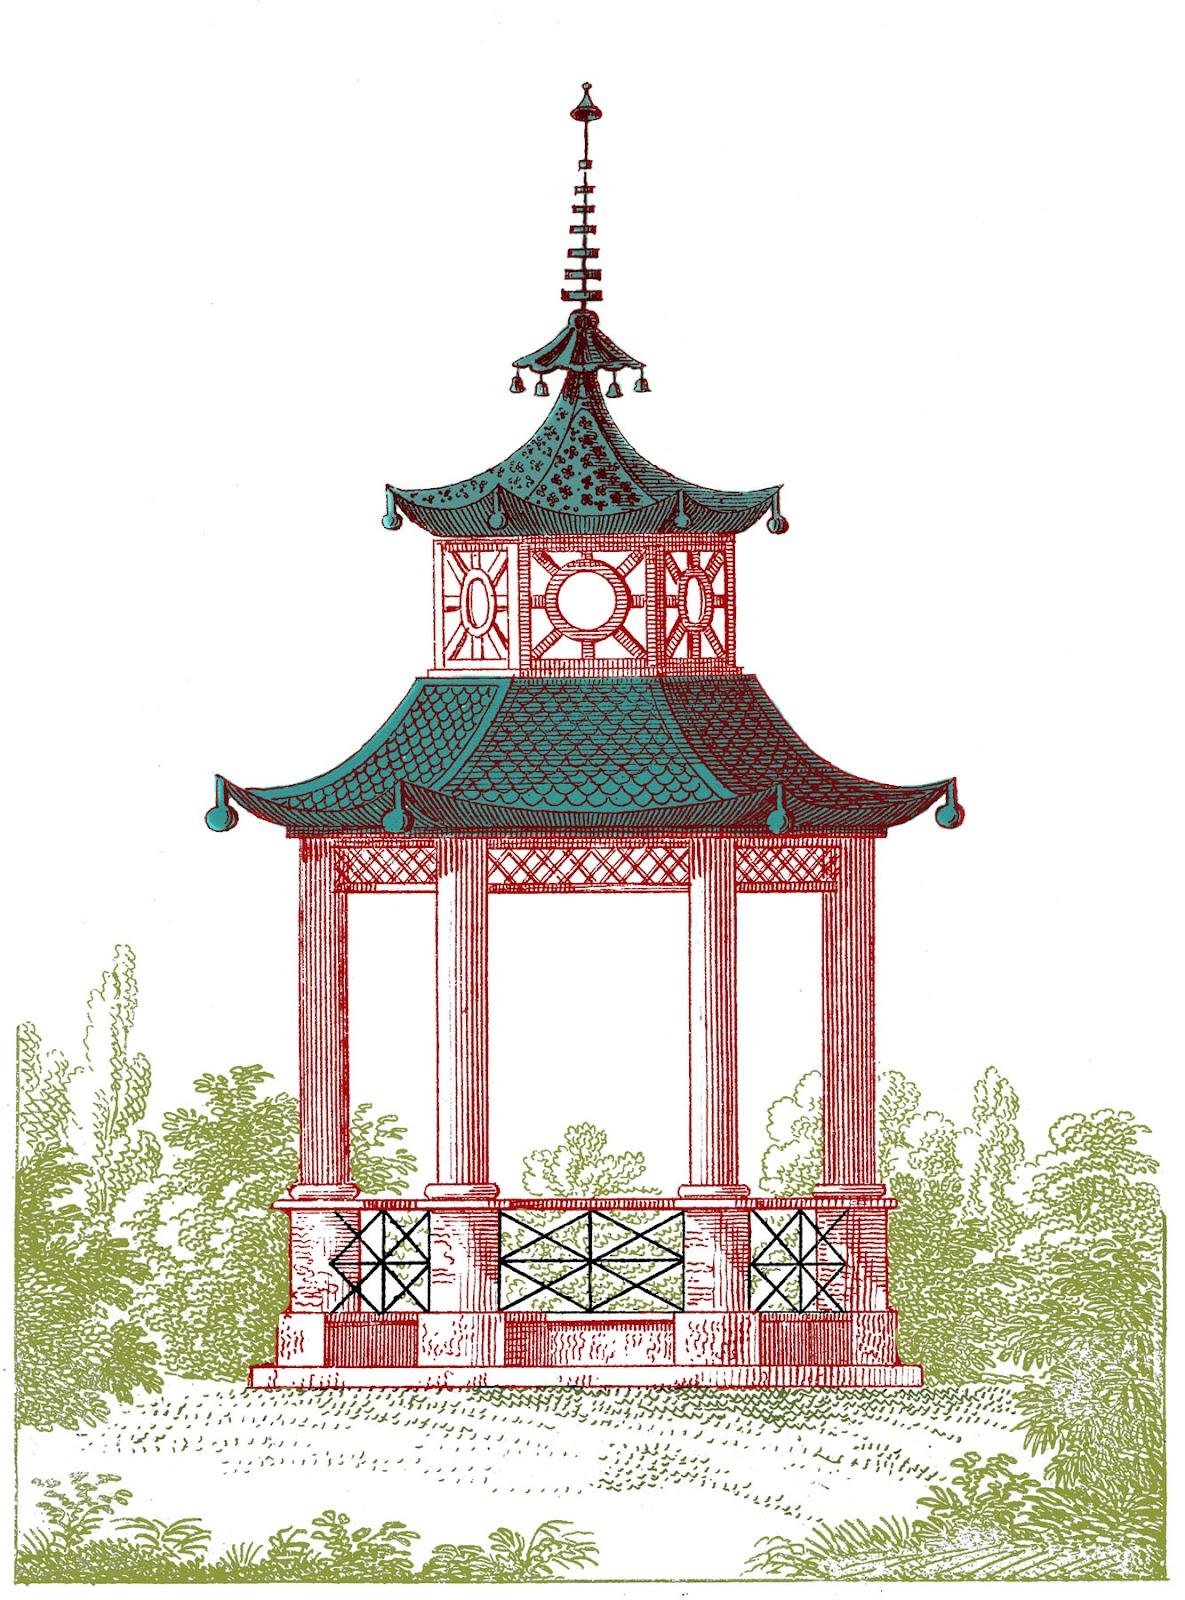 Antique Garden Graphic - Beautiful Pagoda Gazebo - The Graphics Fairy